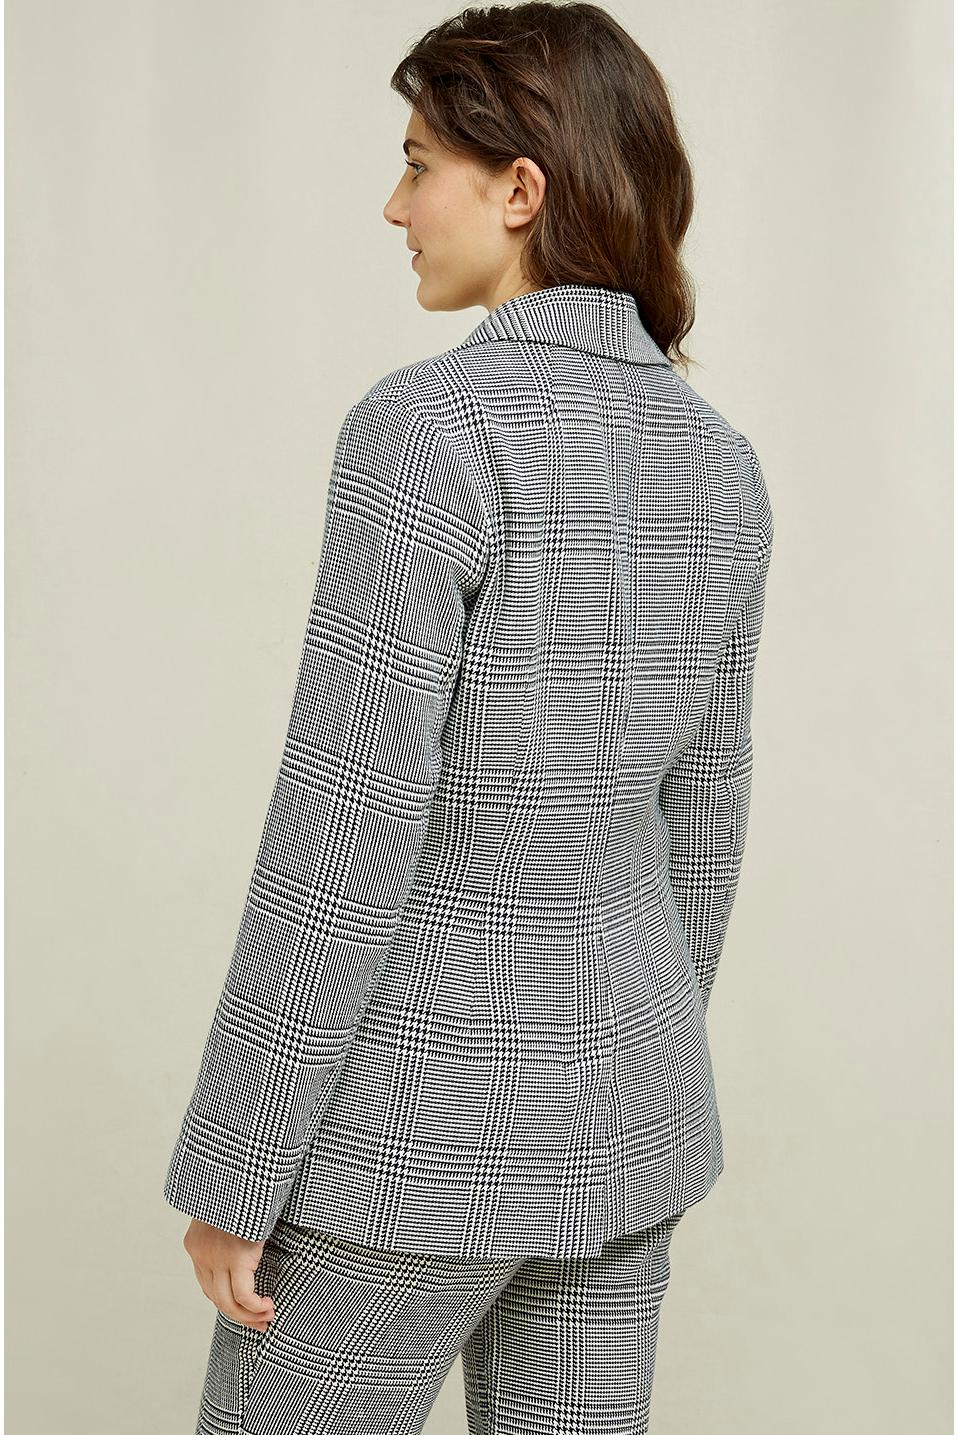 Roberta Organic Fashion Peopletree Blazer Mirren Checkered 6